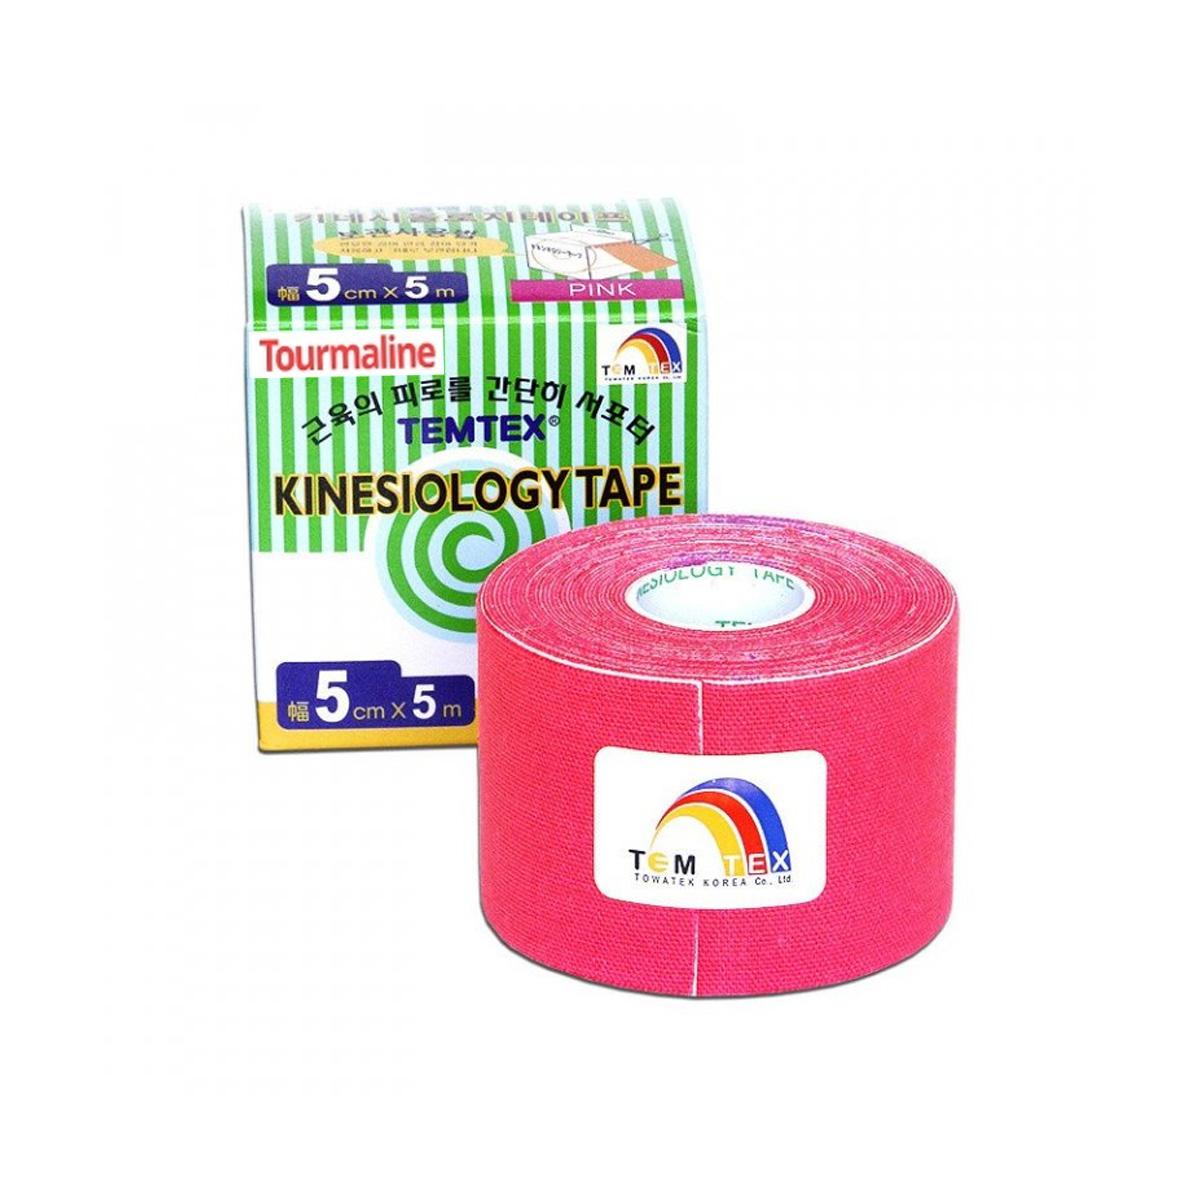 Temtex kinesio tape Tourmaline růžová 5cm x 5m